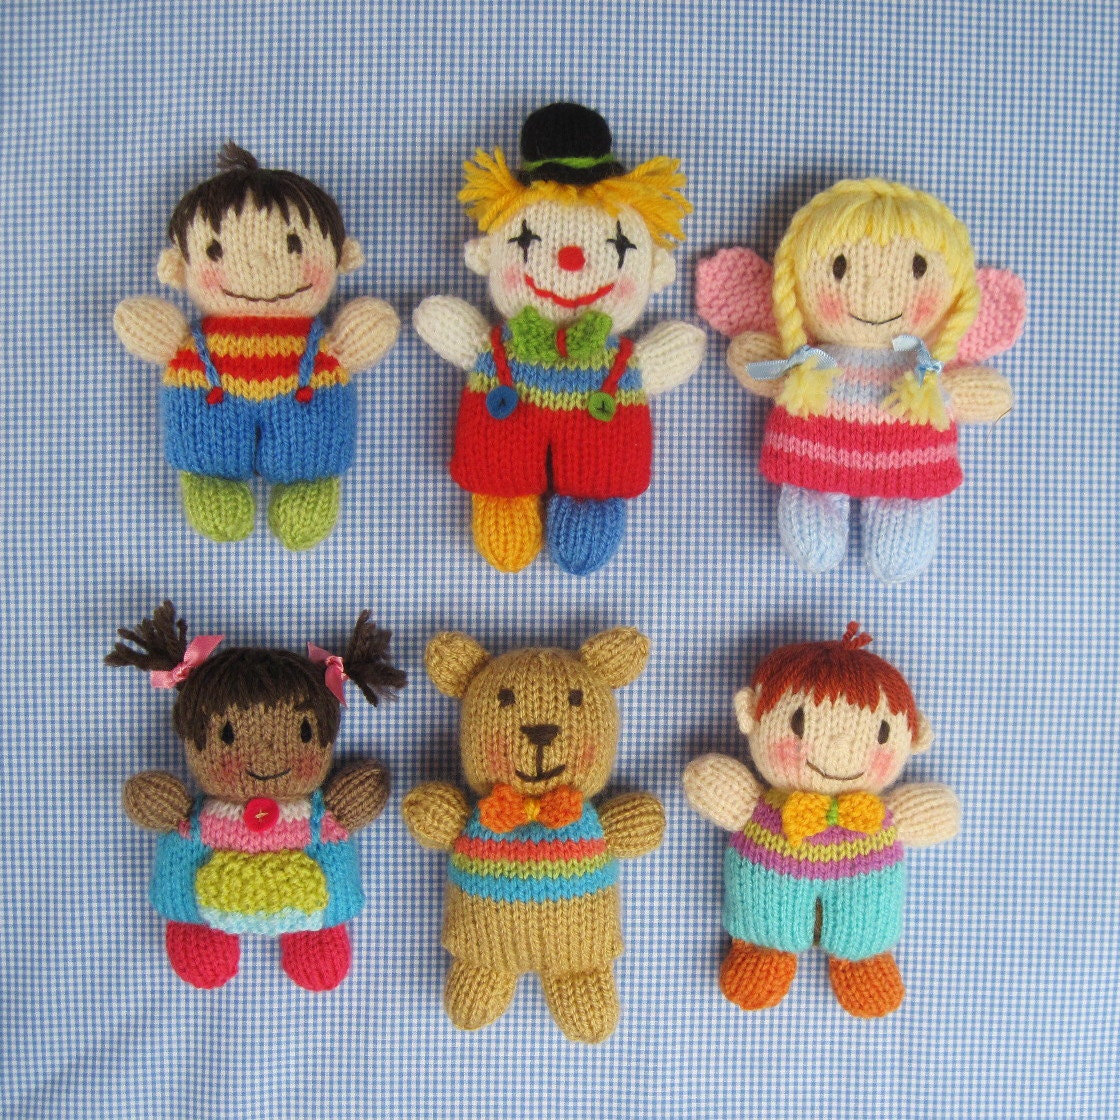 Knitting Patterns For Dolls And Teddy Bears : Toyshelf Tots toy girls boys fairy clown and teddy bear